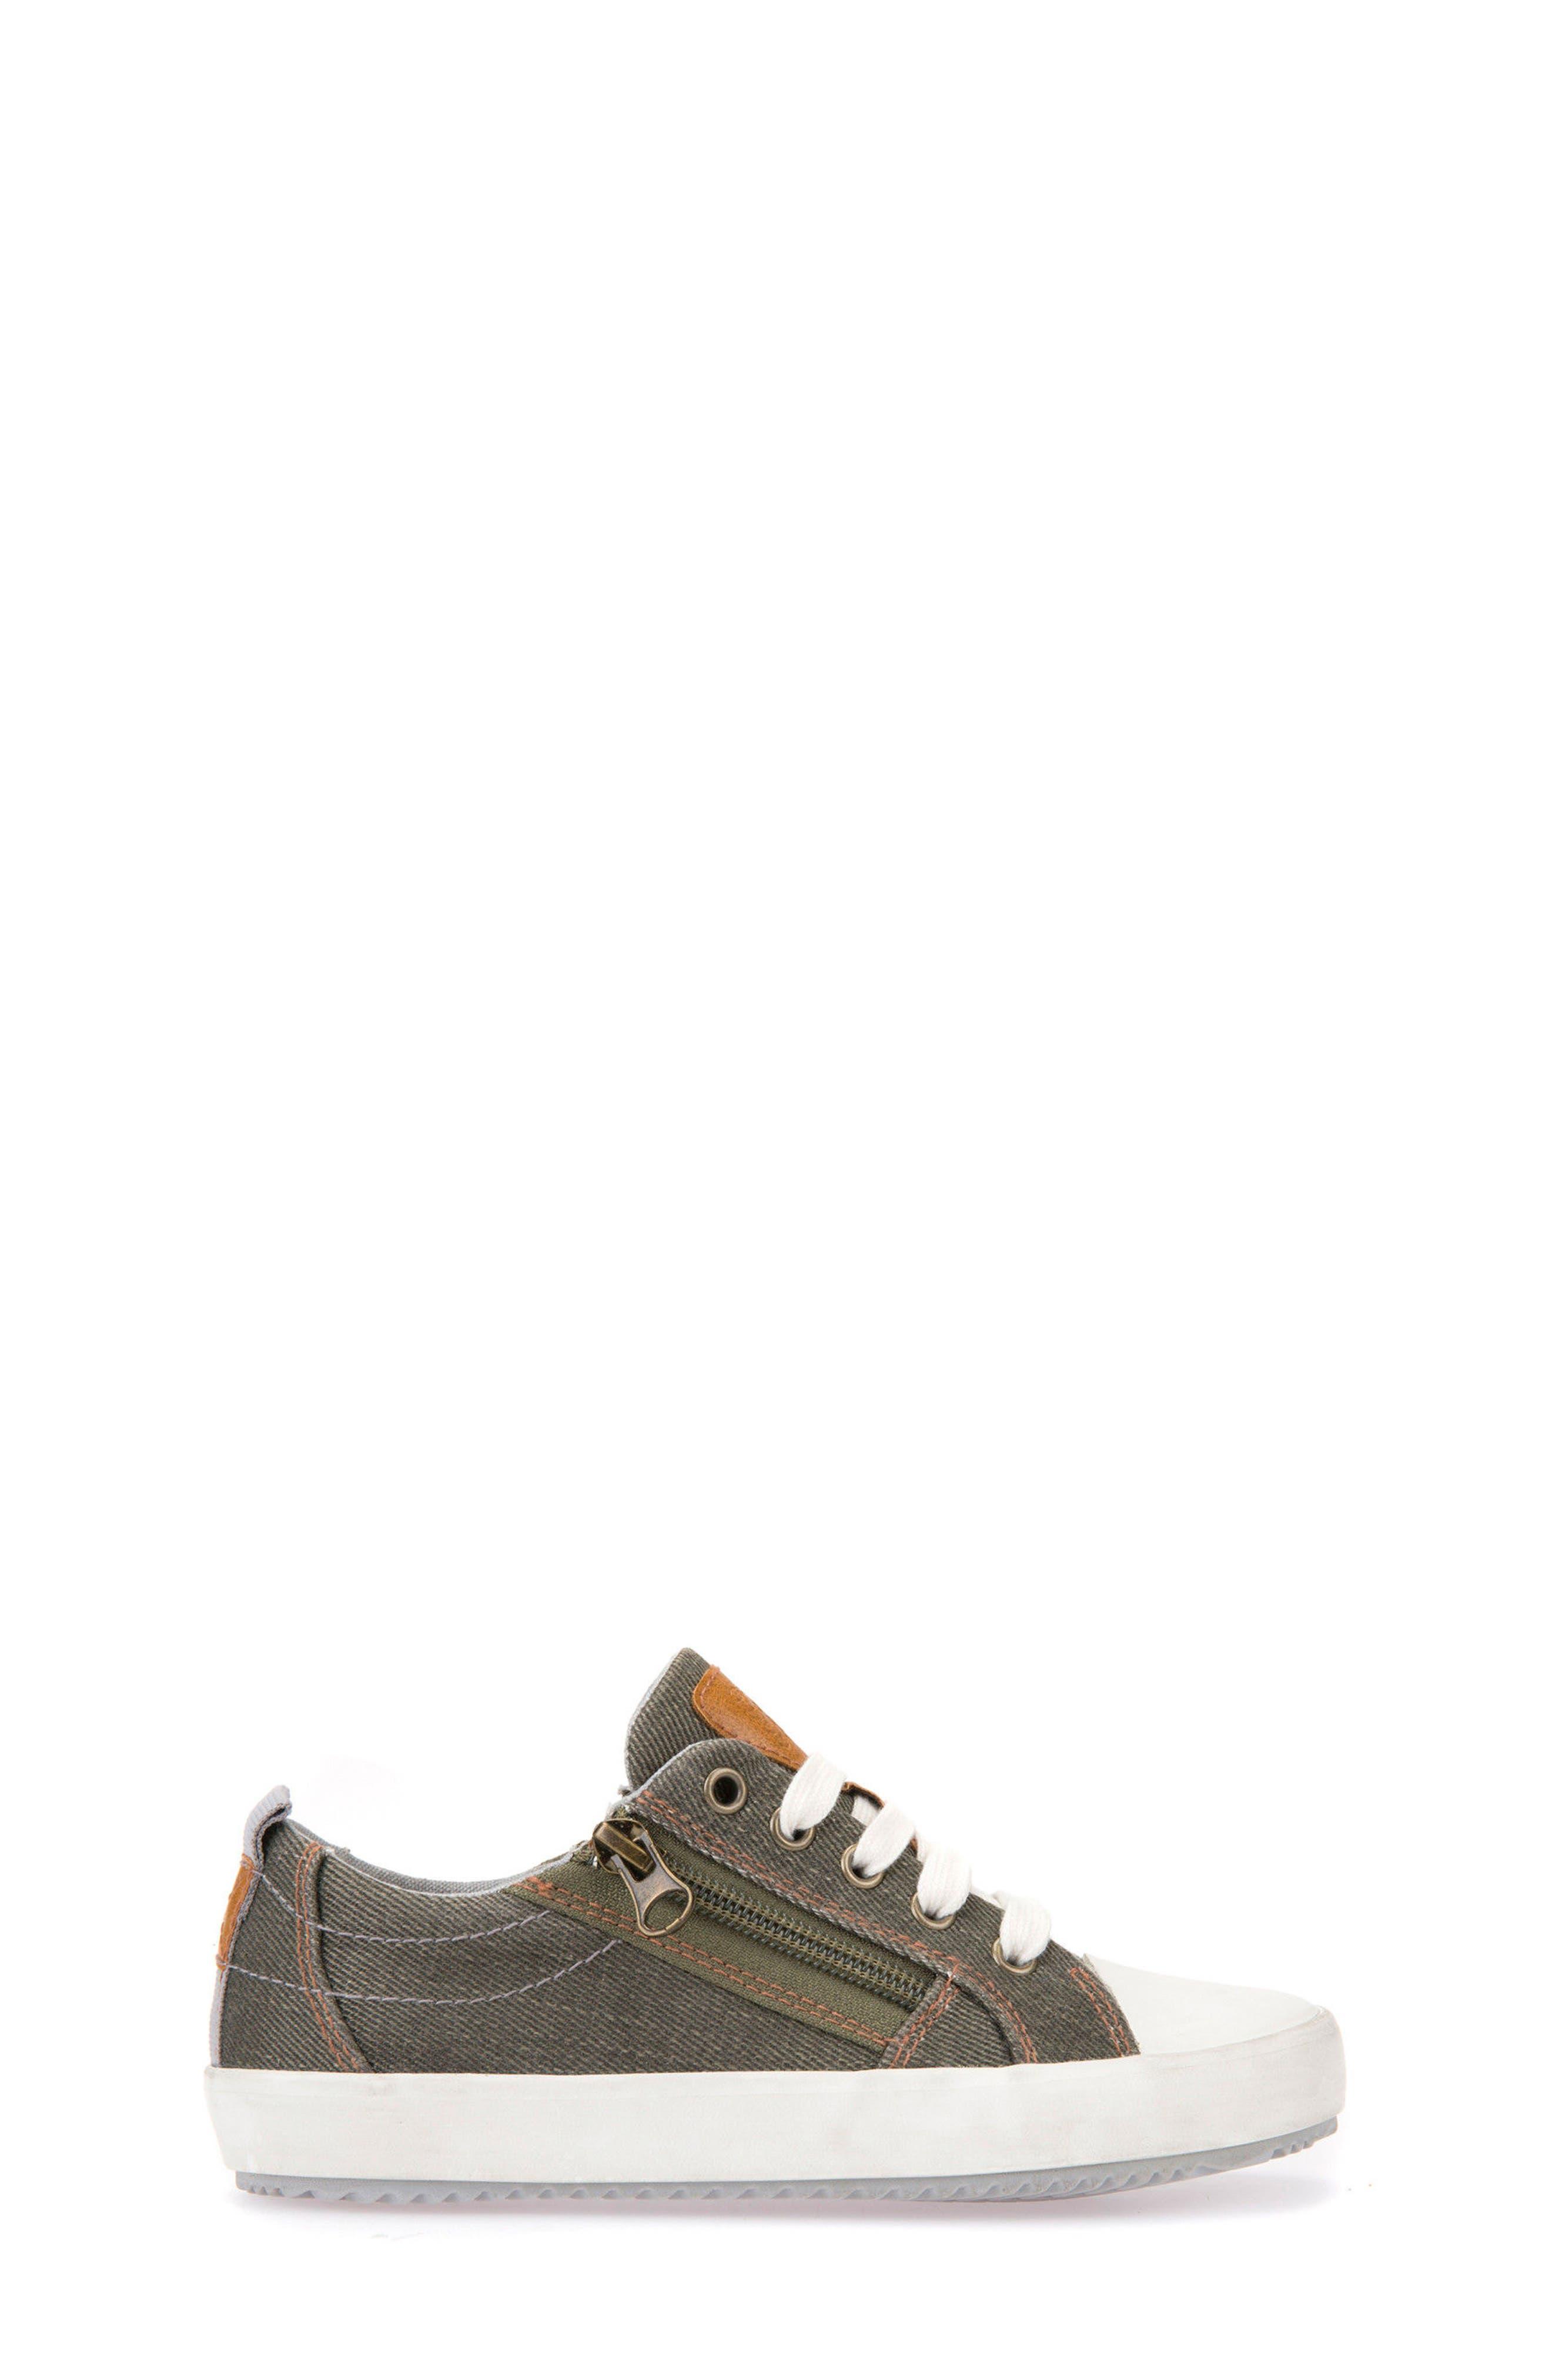 Alternate Image 3  - Geox Alonisso Low Top Sneaker (Toddler, Little Kid & Big Kid)